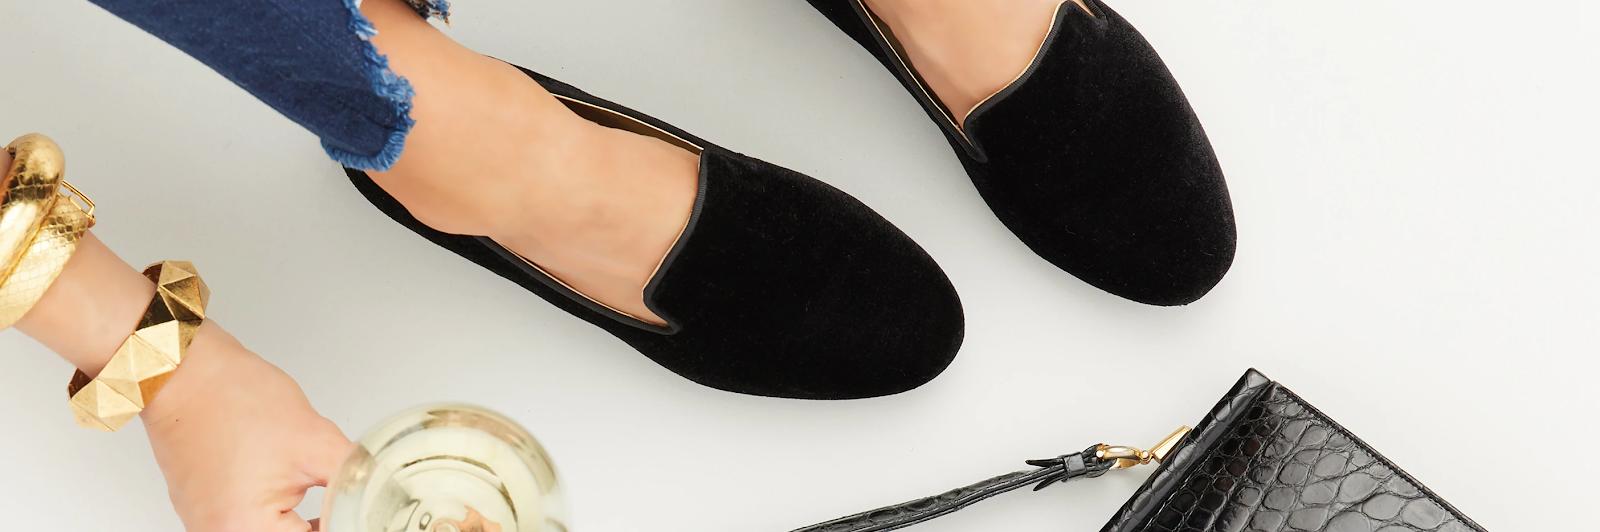 Birdies Shoes Review 6